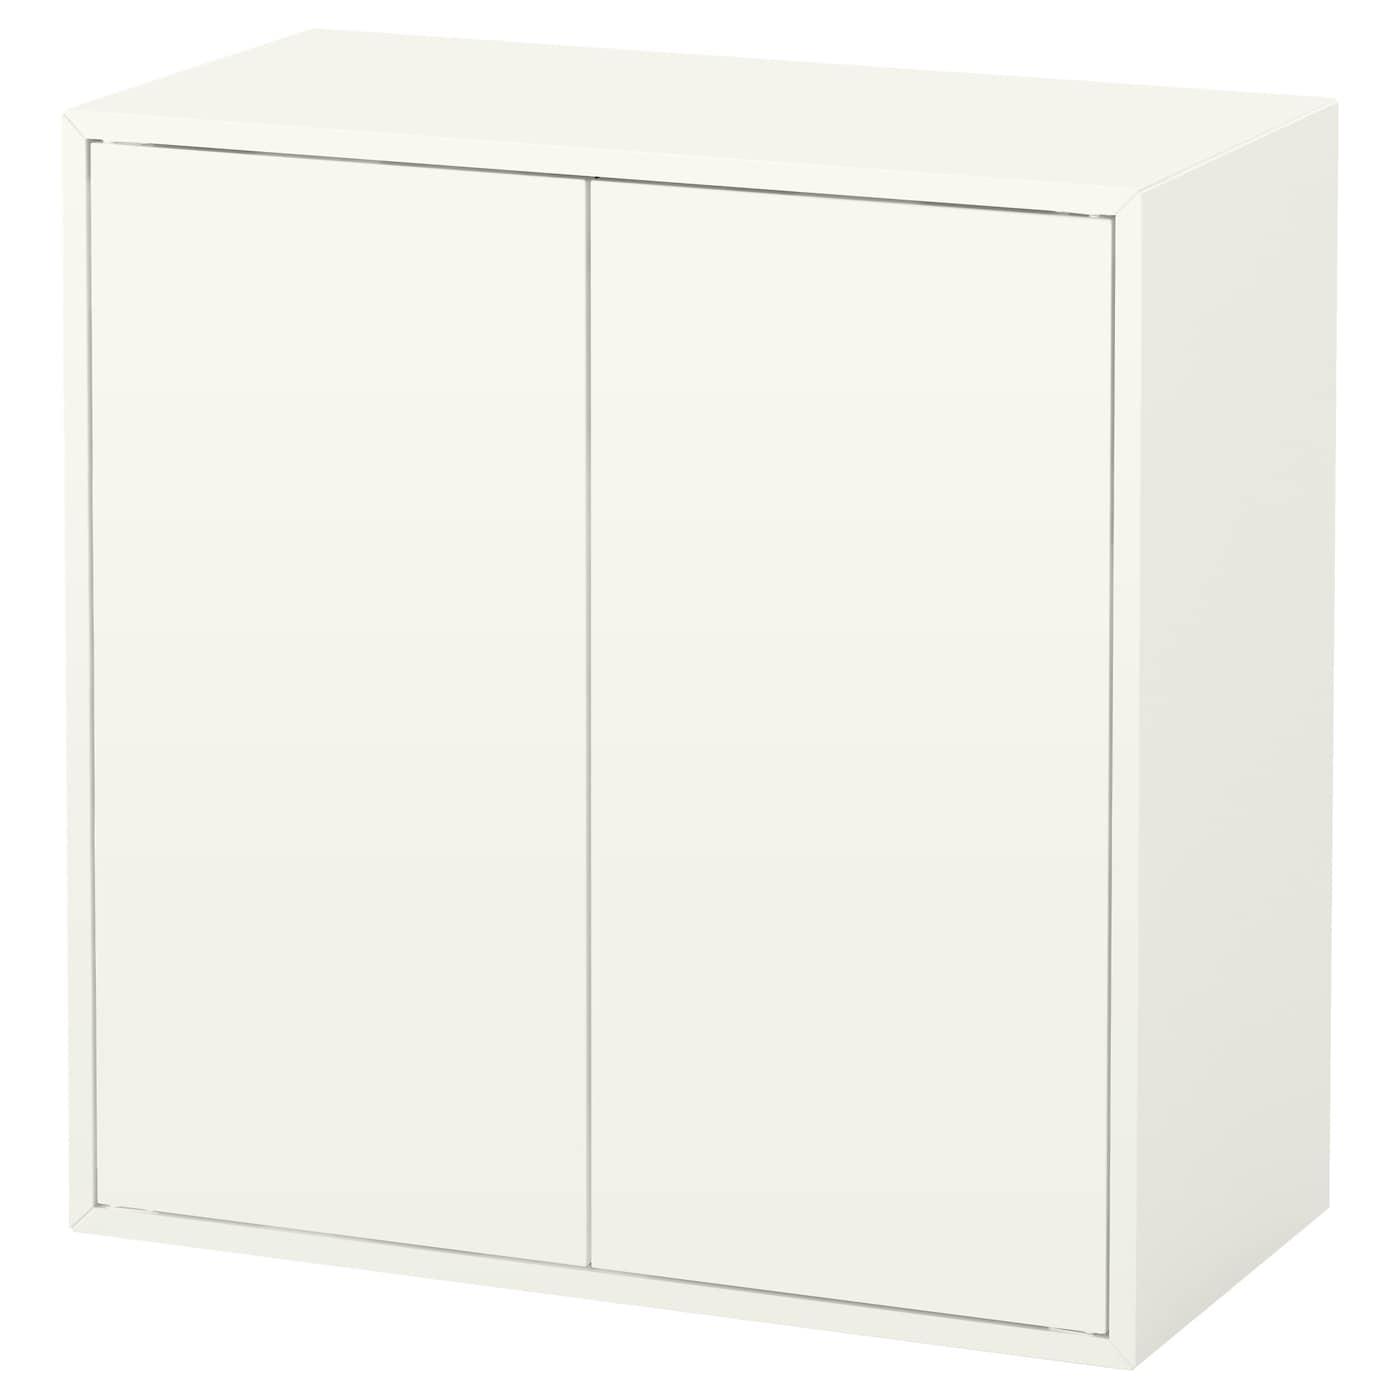 EKET Armoire 2 portes, 1 tablette - blanc - IKEA